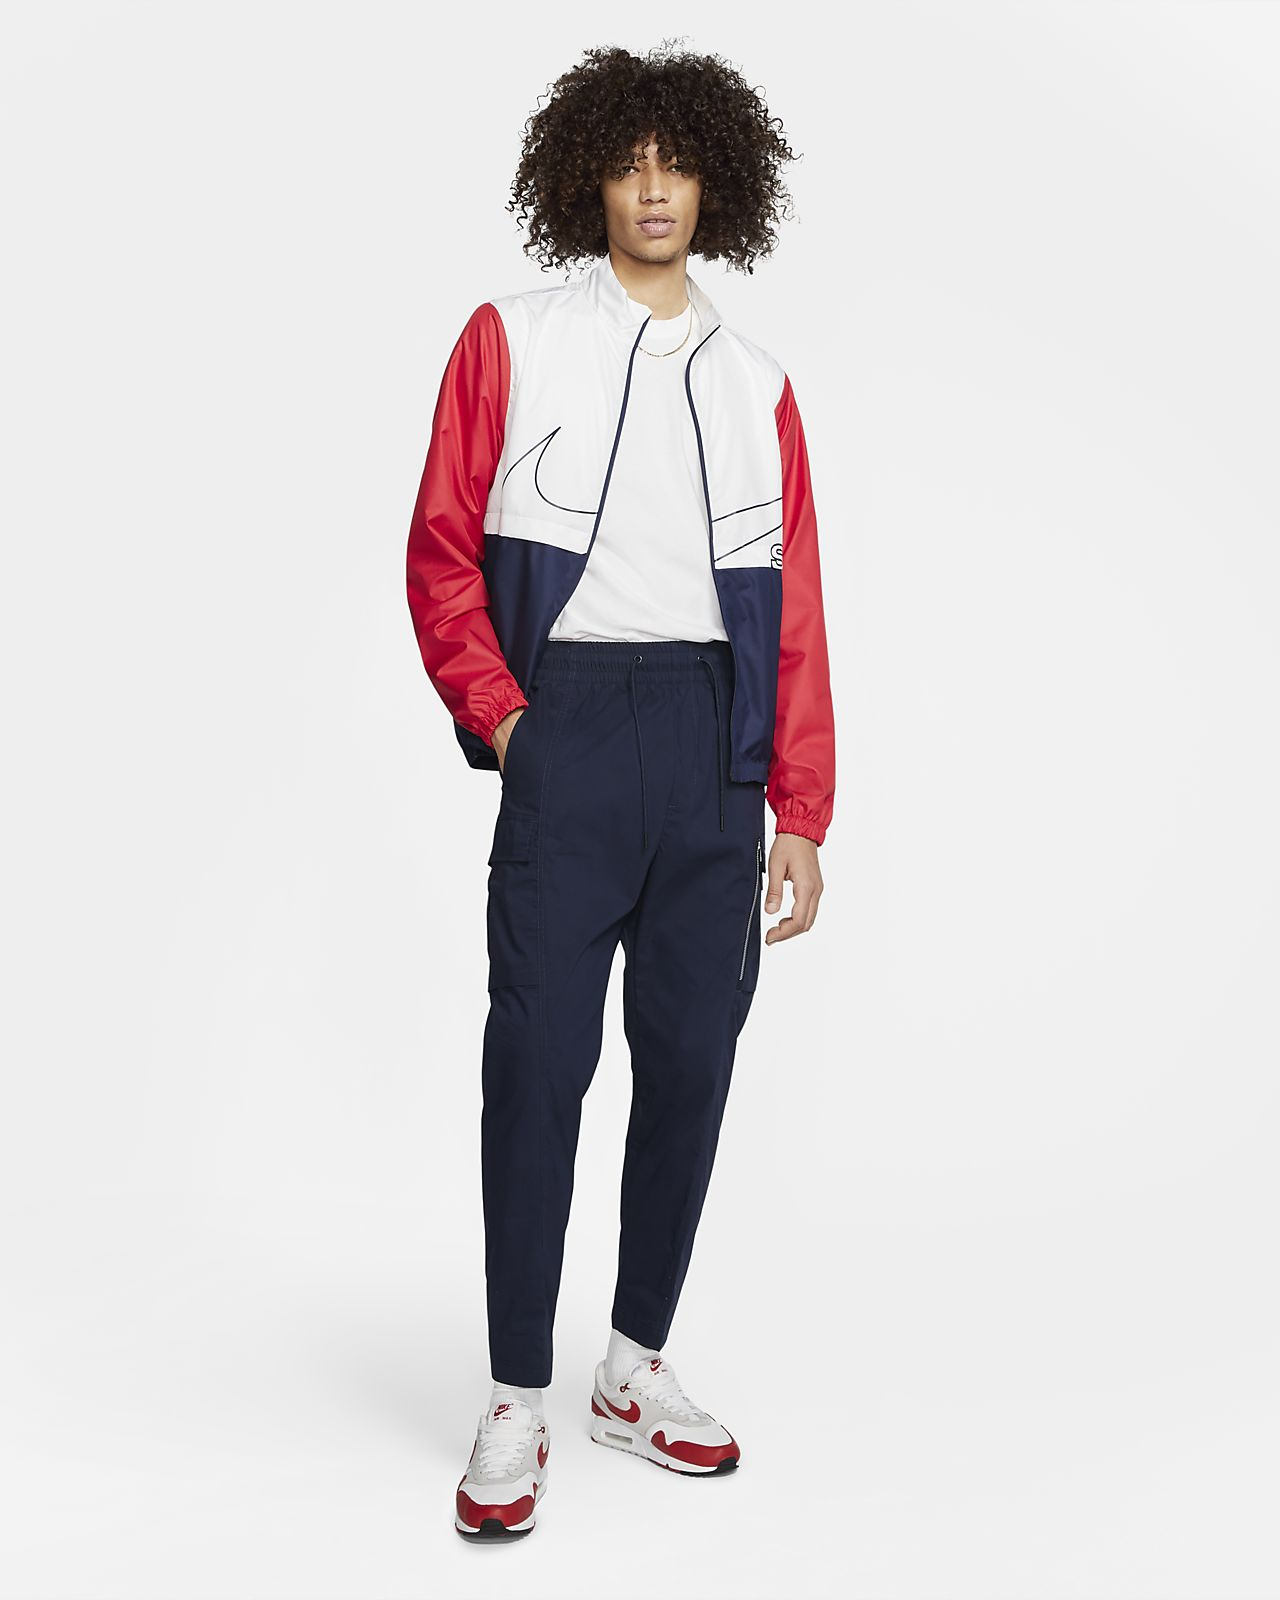 Nike SB Men's Skate Track Jacket